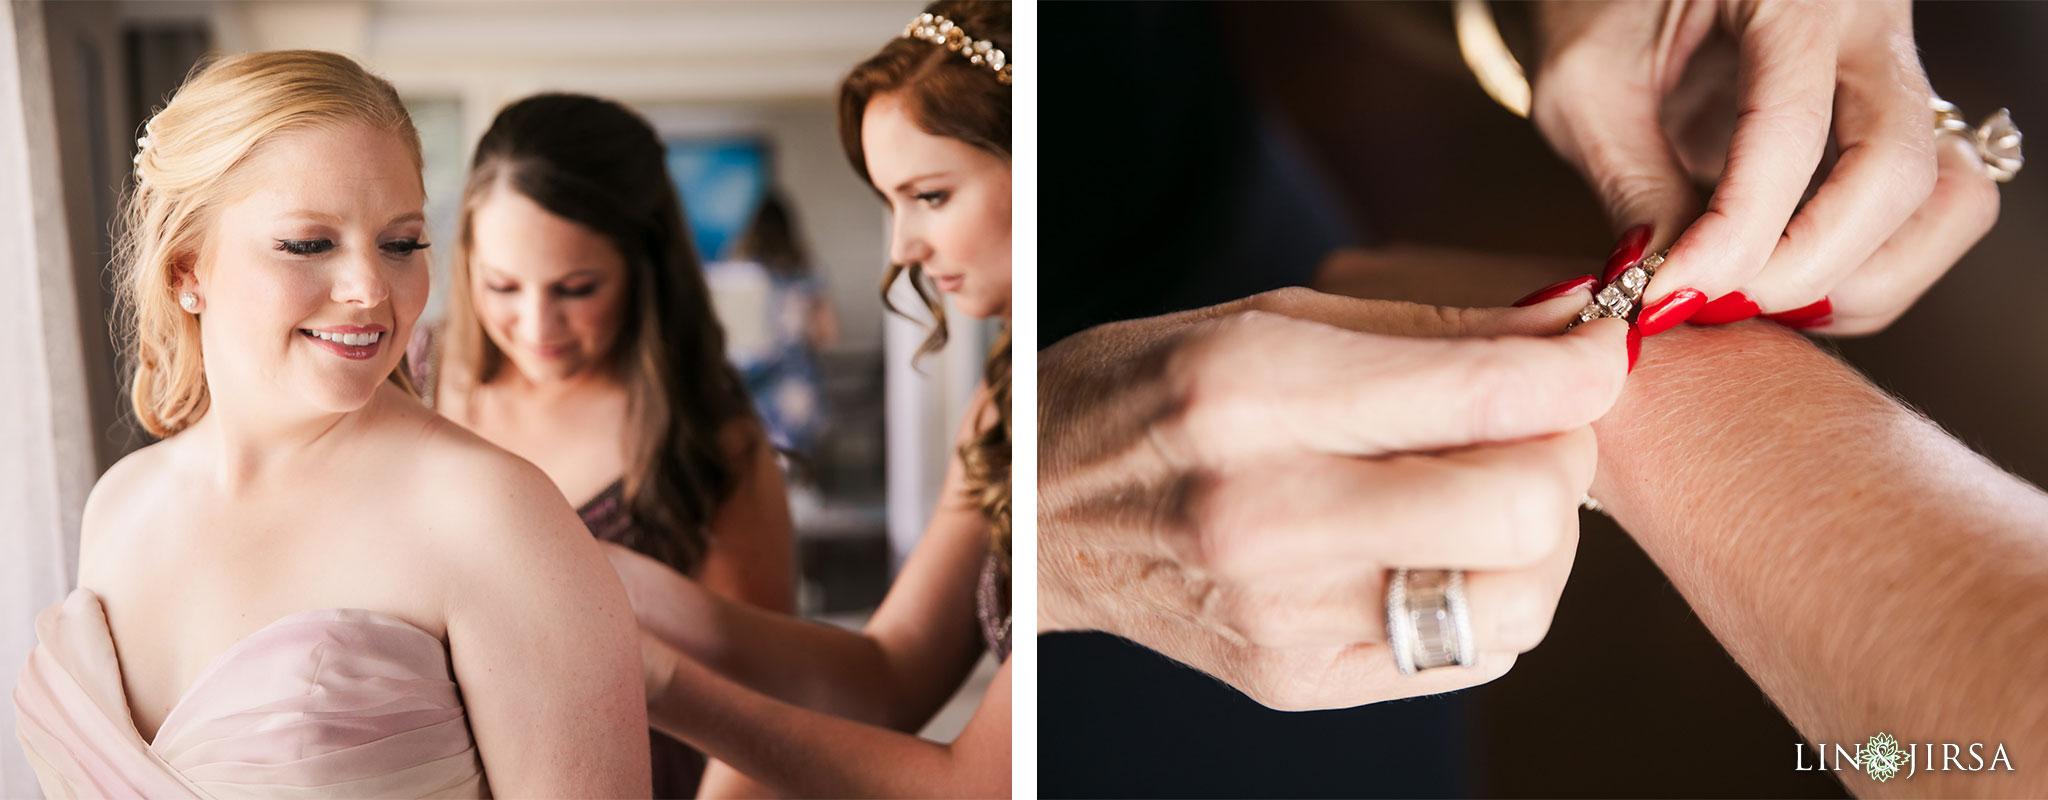 03 ritz carlton laguna niguel wedding photography